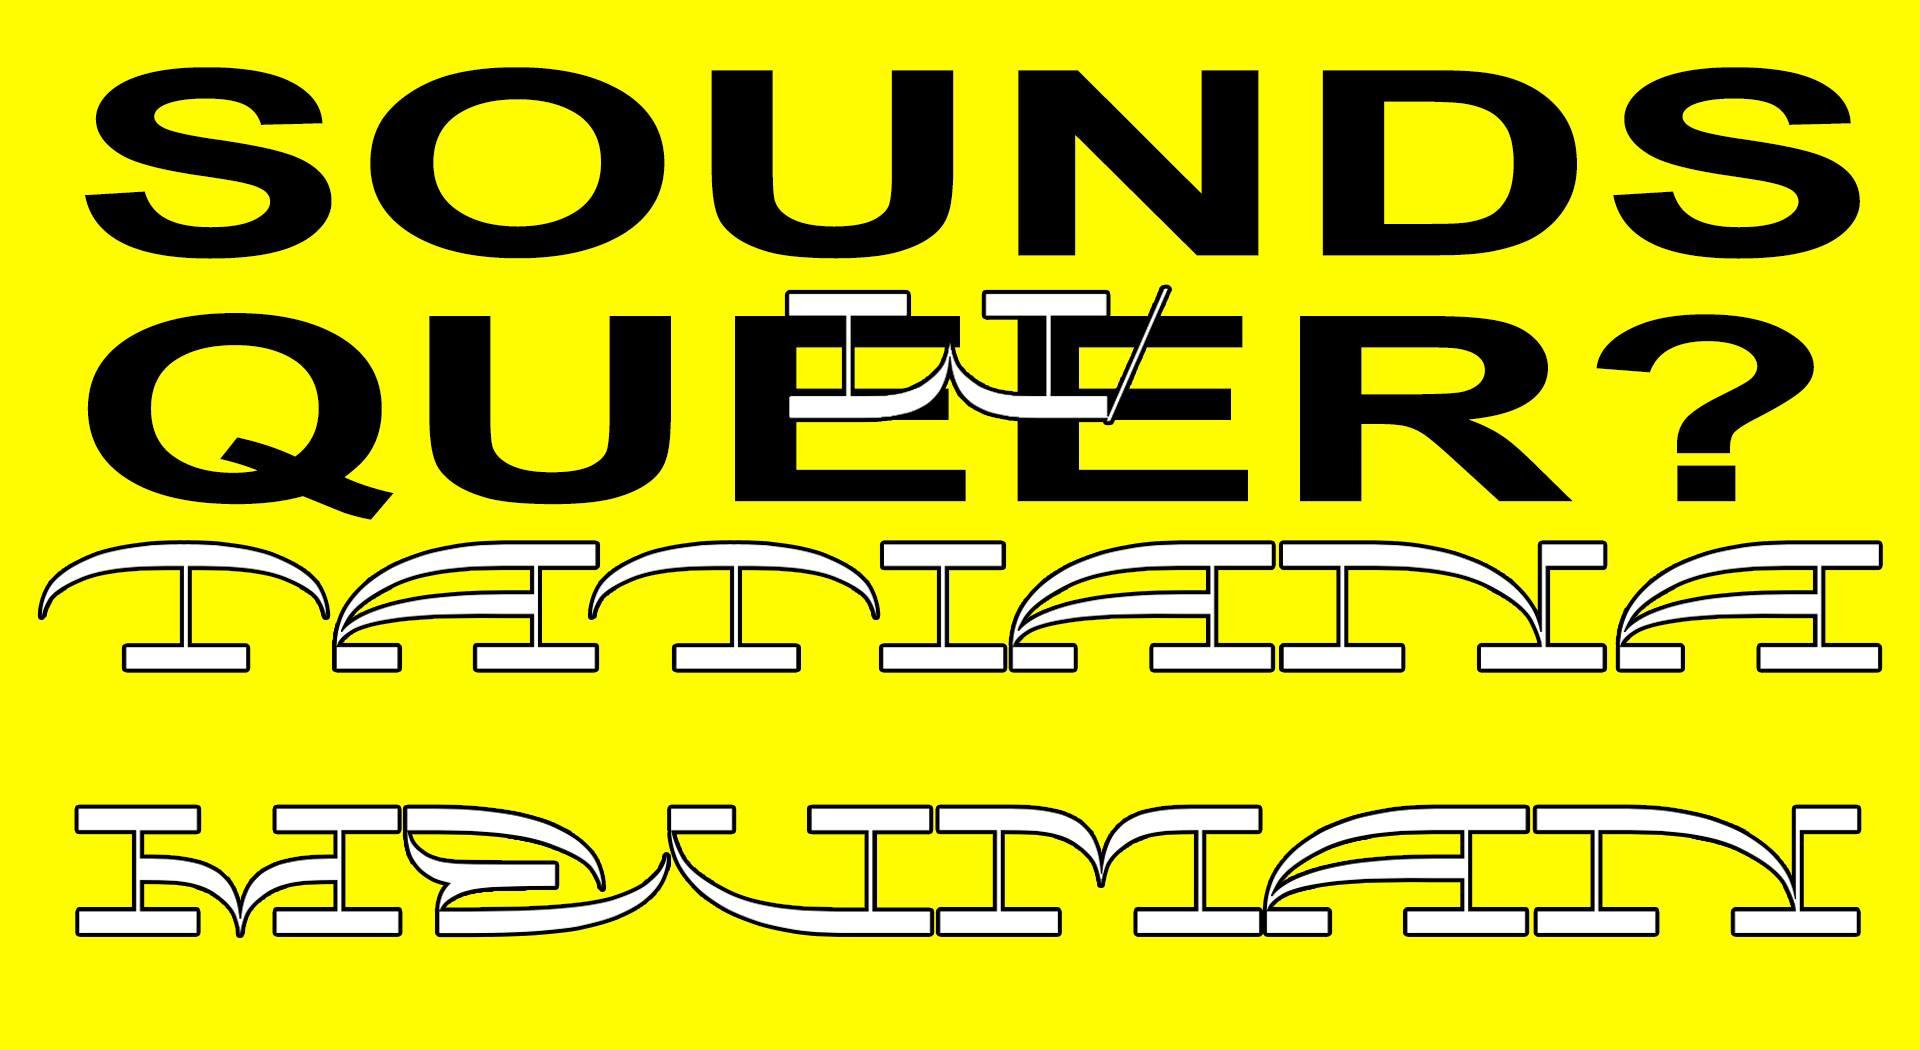 NE / 13.1. / 17.00 / S(o)unday Mixtapes: Sounds Queer? – Sampling Lab w/ Tatiana Heuman  / workshop